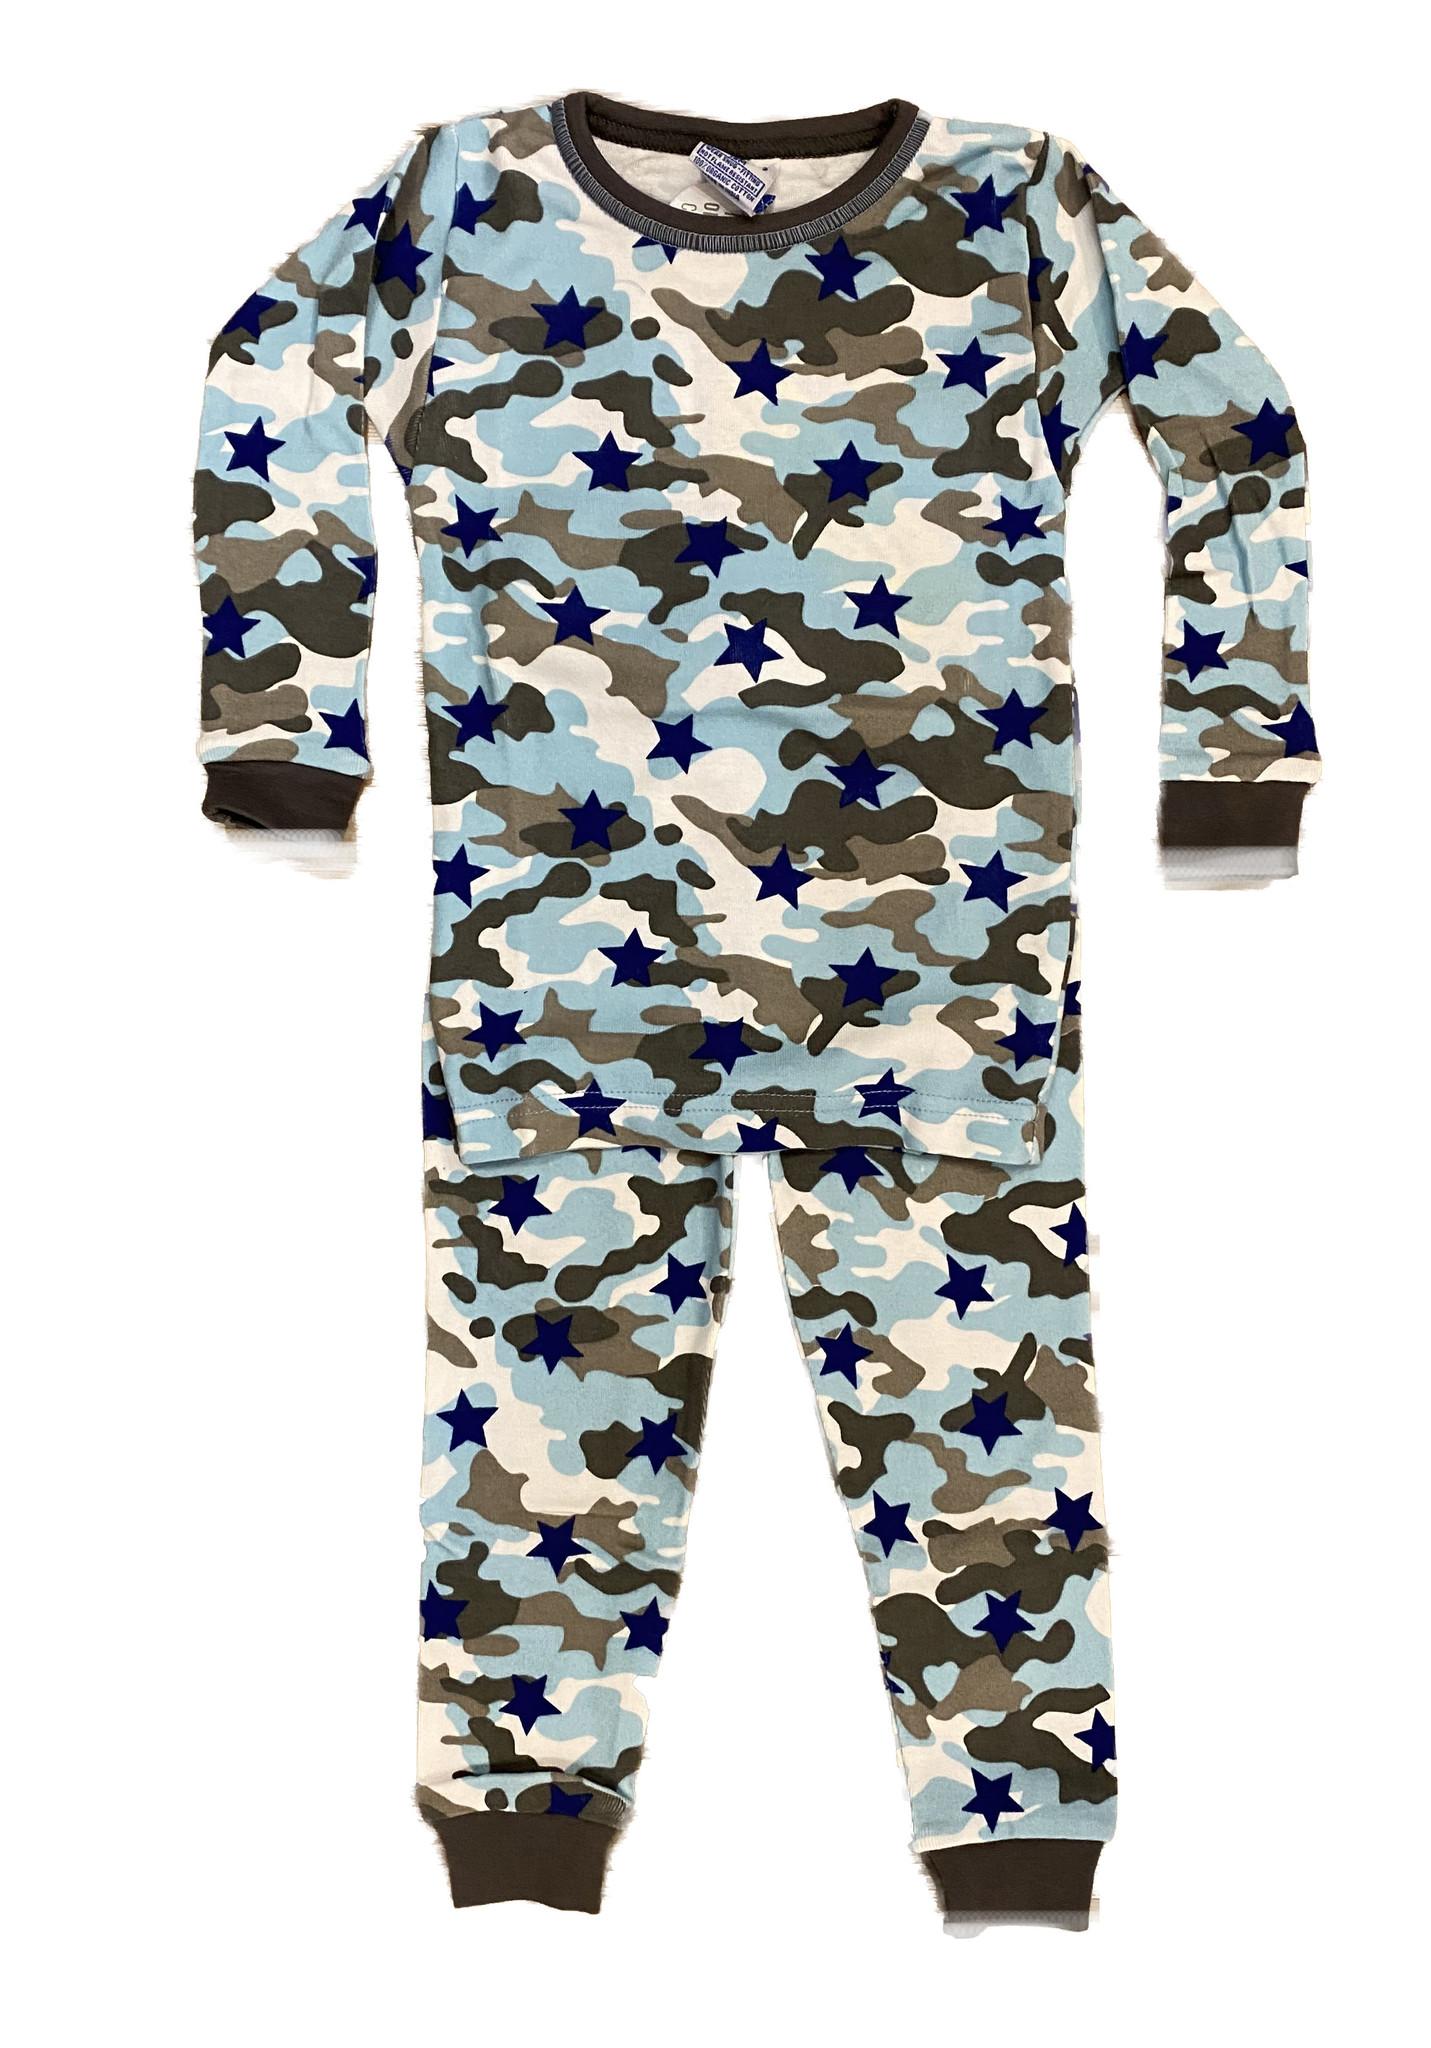 Baby Steps Blue Camo Star PJ Set